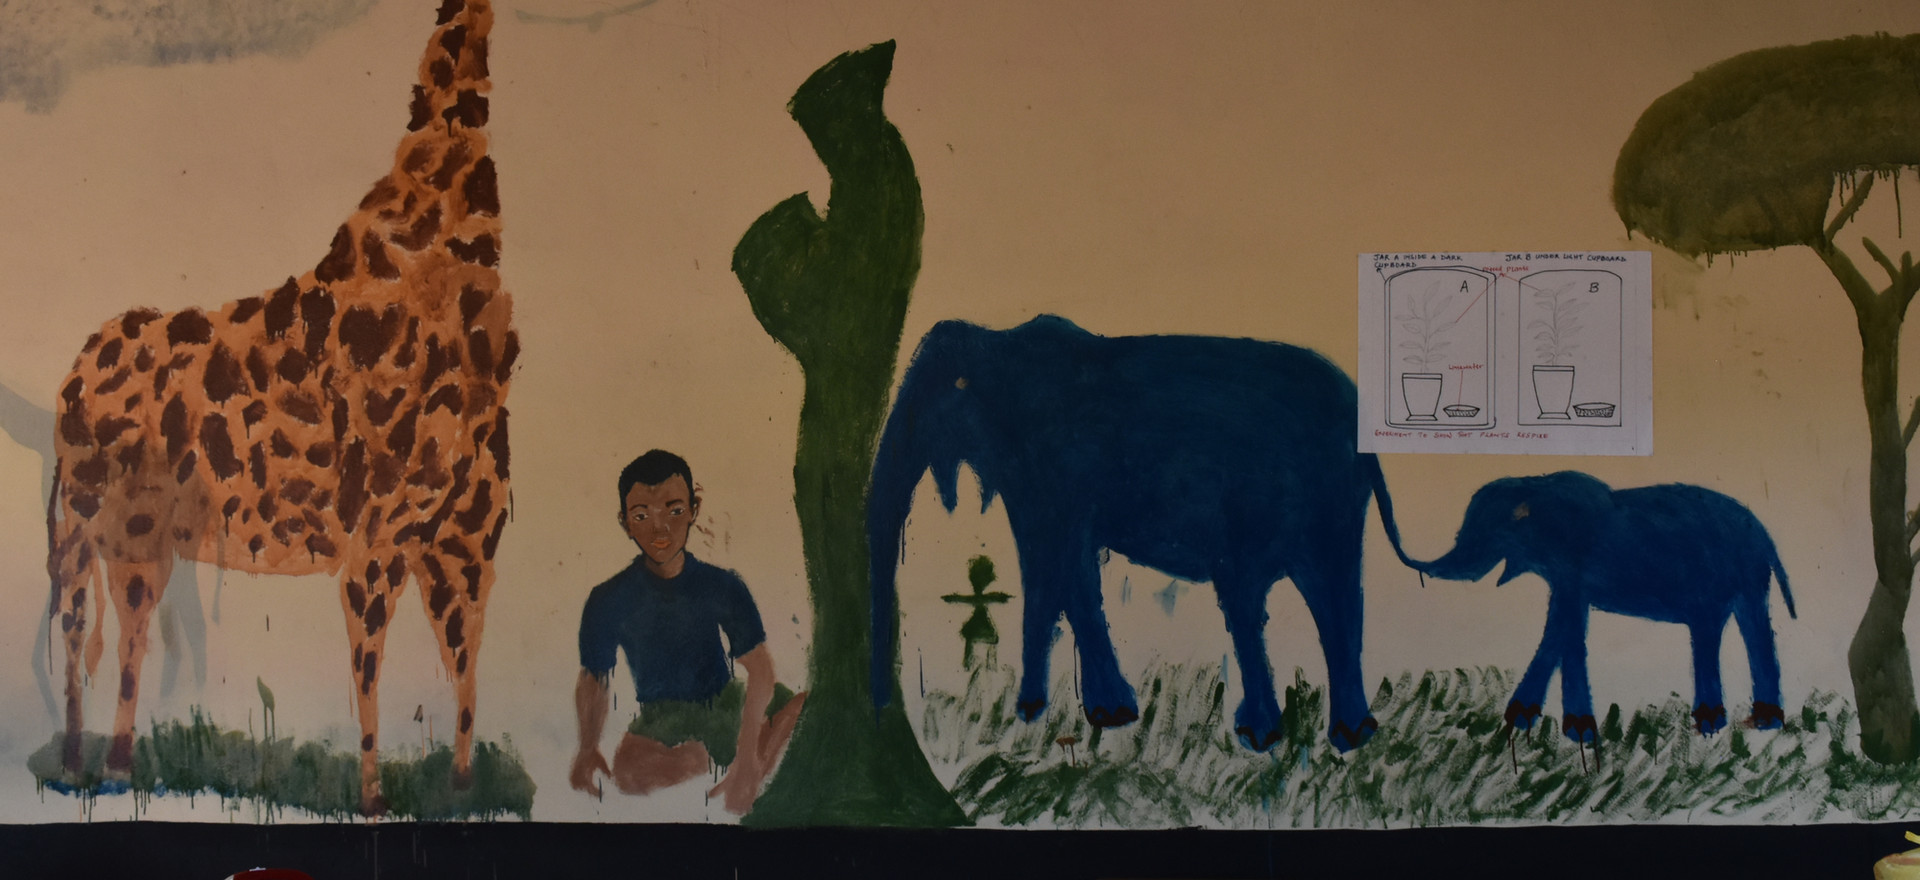 Zambia Twabuka School Wall